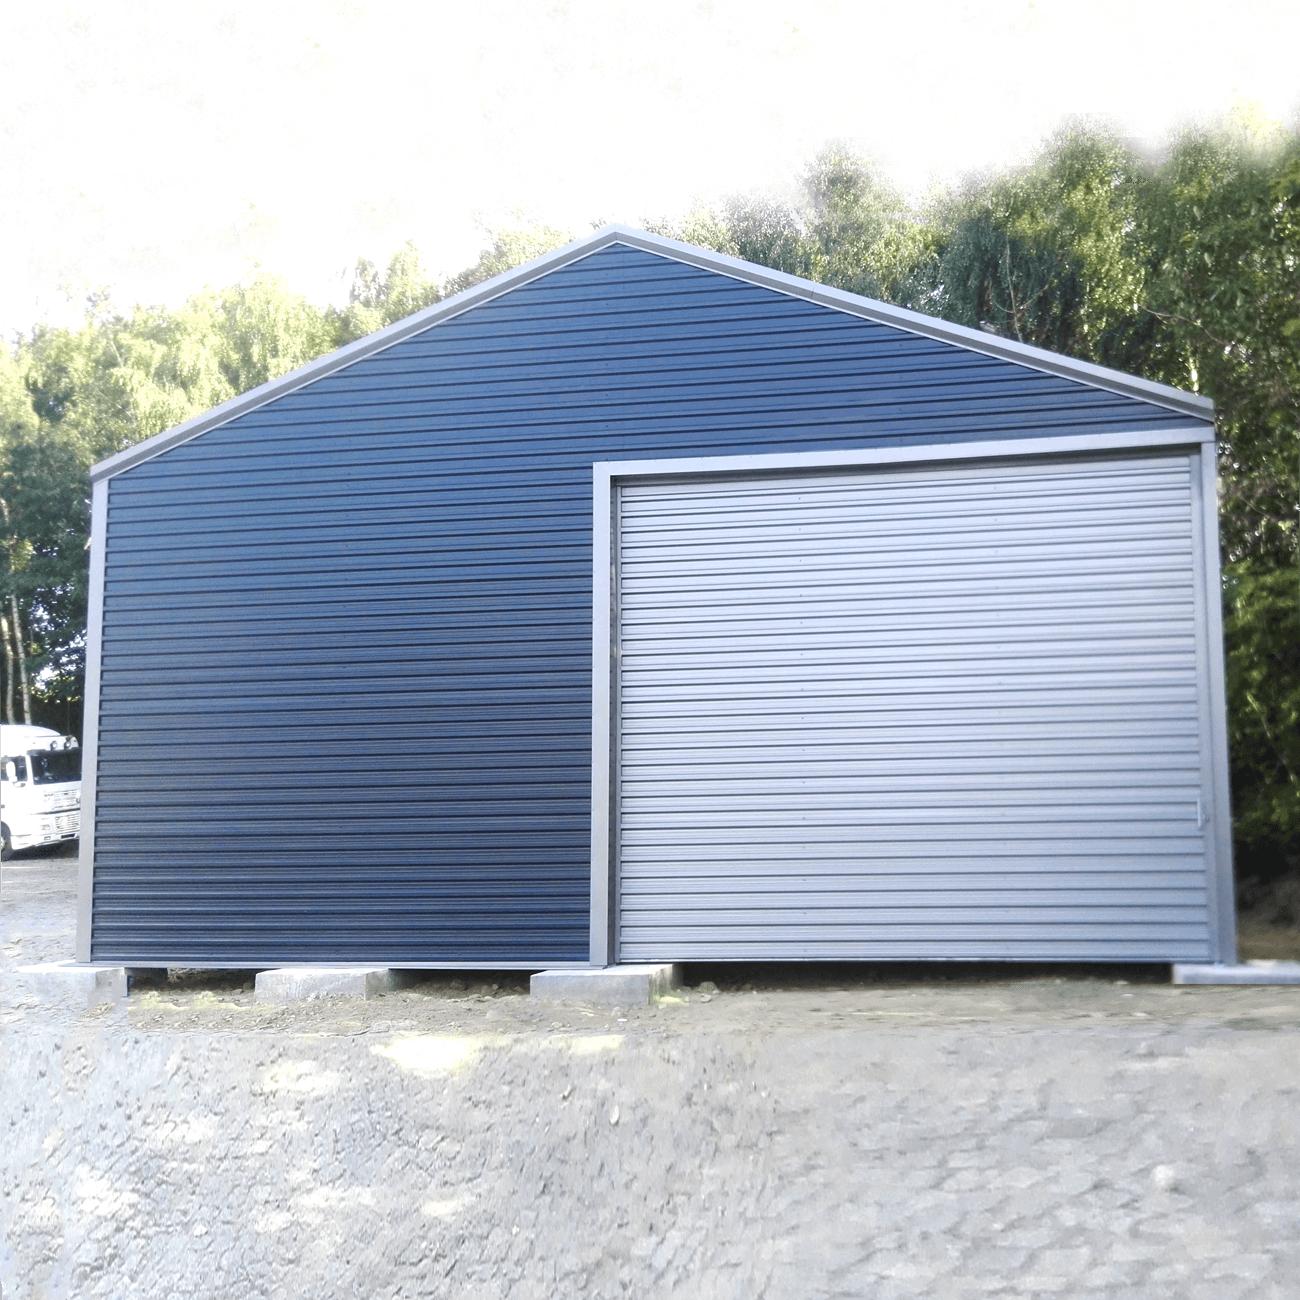 hale namiotowe karpacz